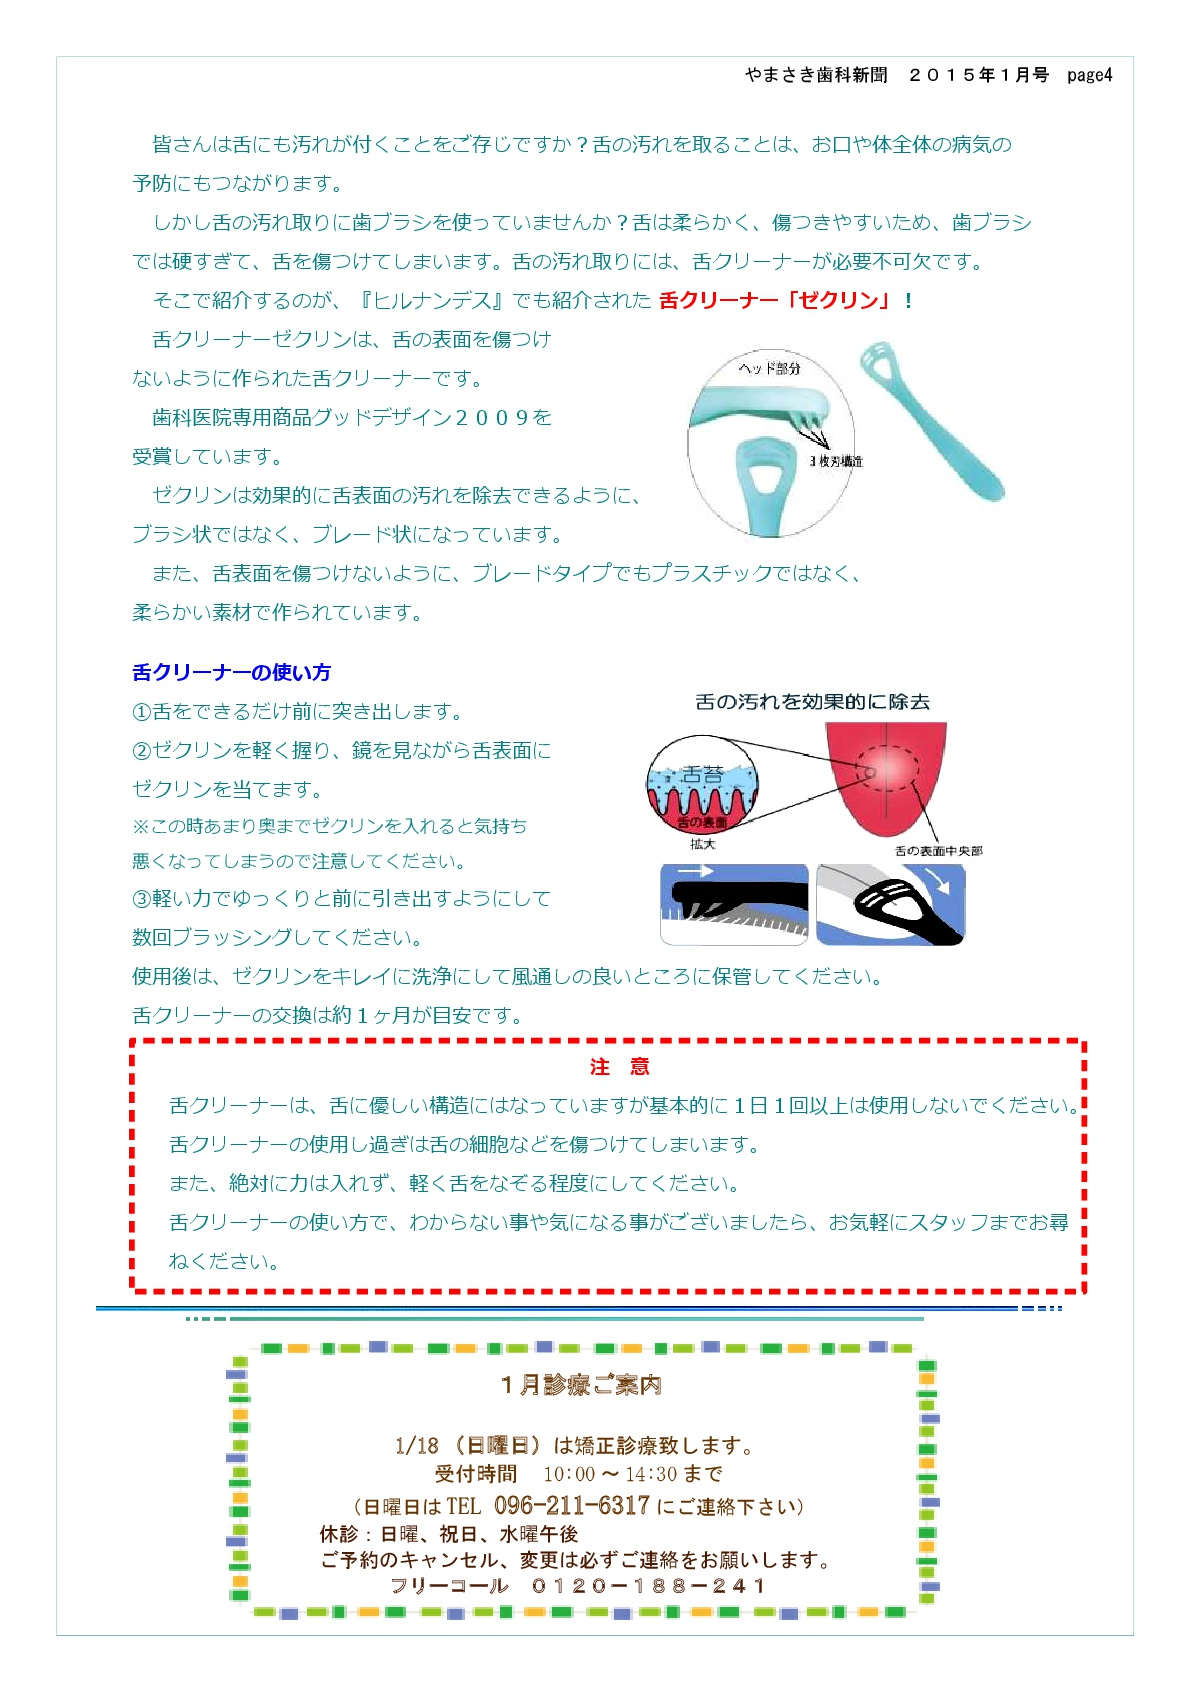 sinbun15-1-2-003